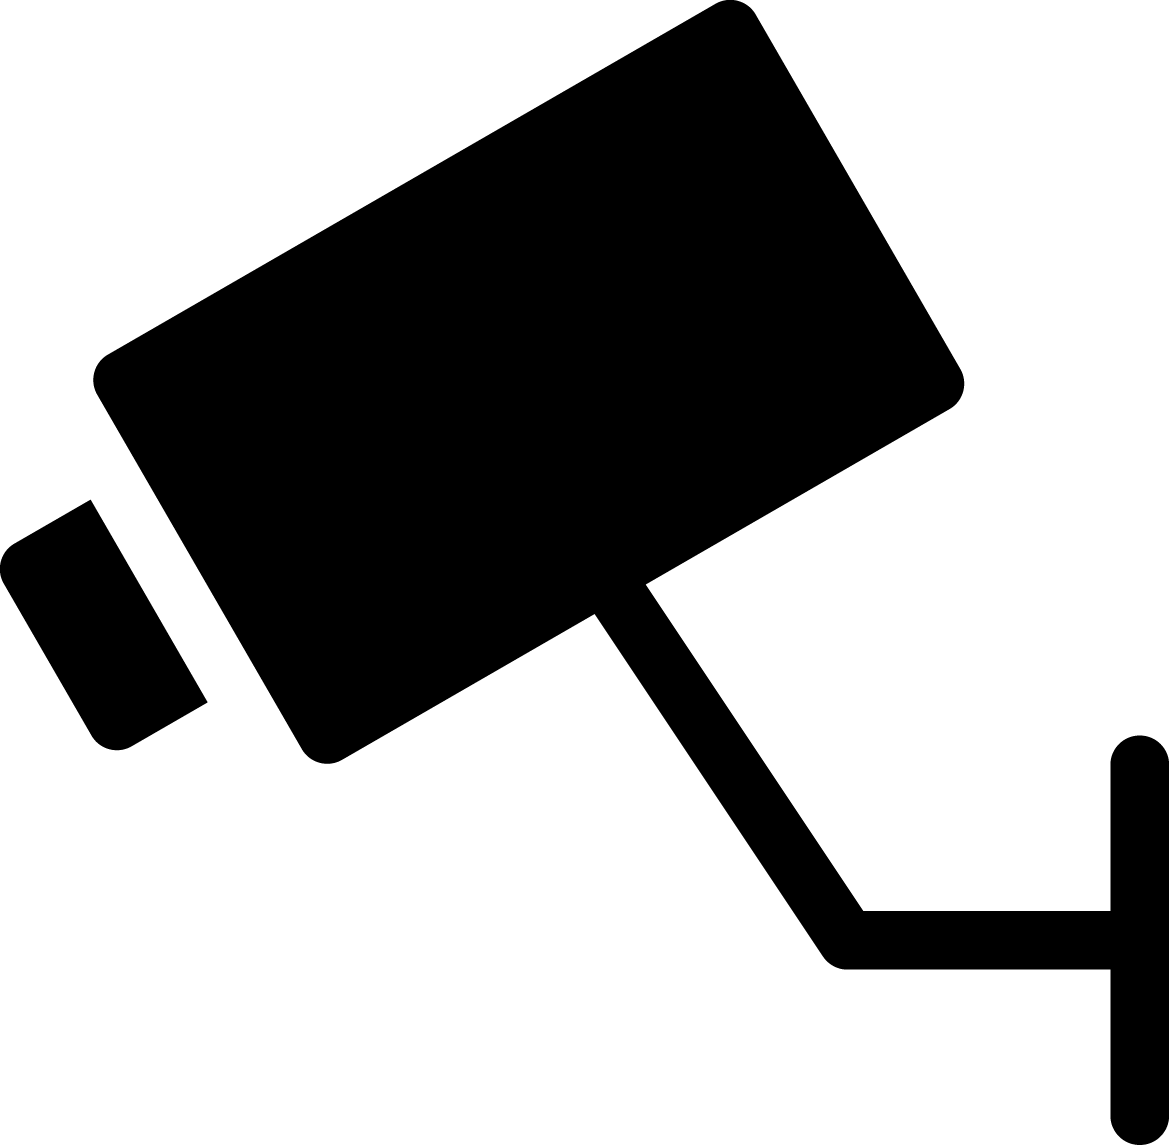 CCTV camera-icon